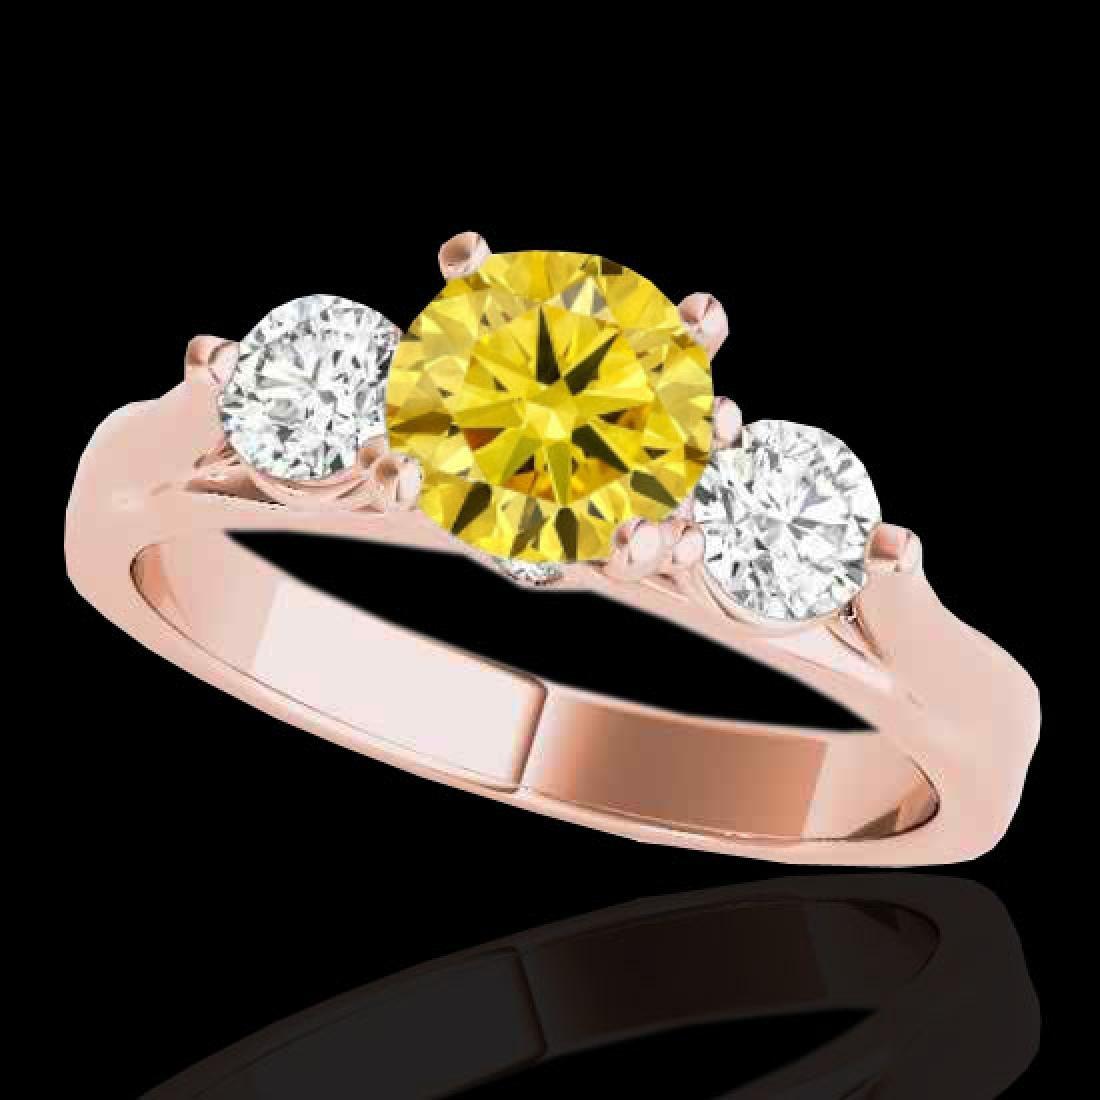 1.5 CTW Certified Si Intense Yellow Diamond 3 Stone